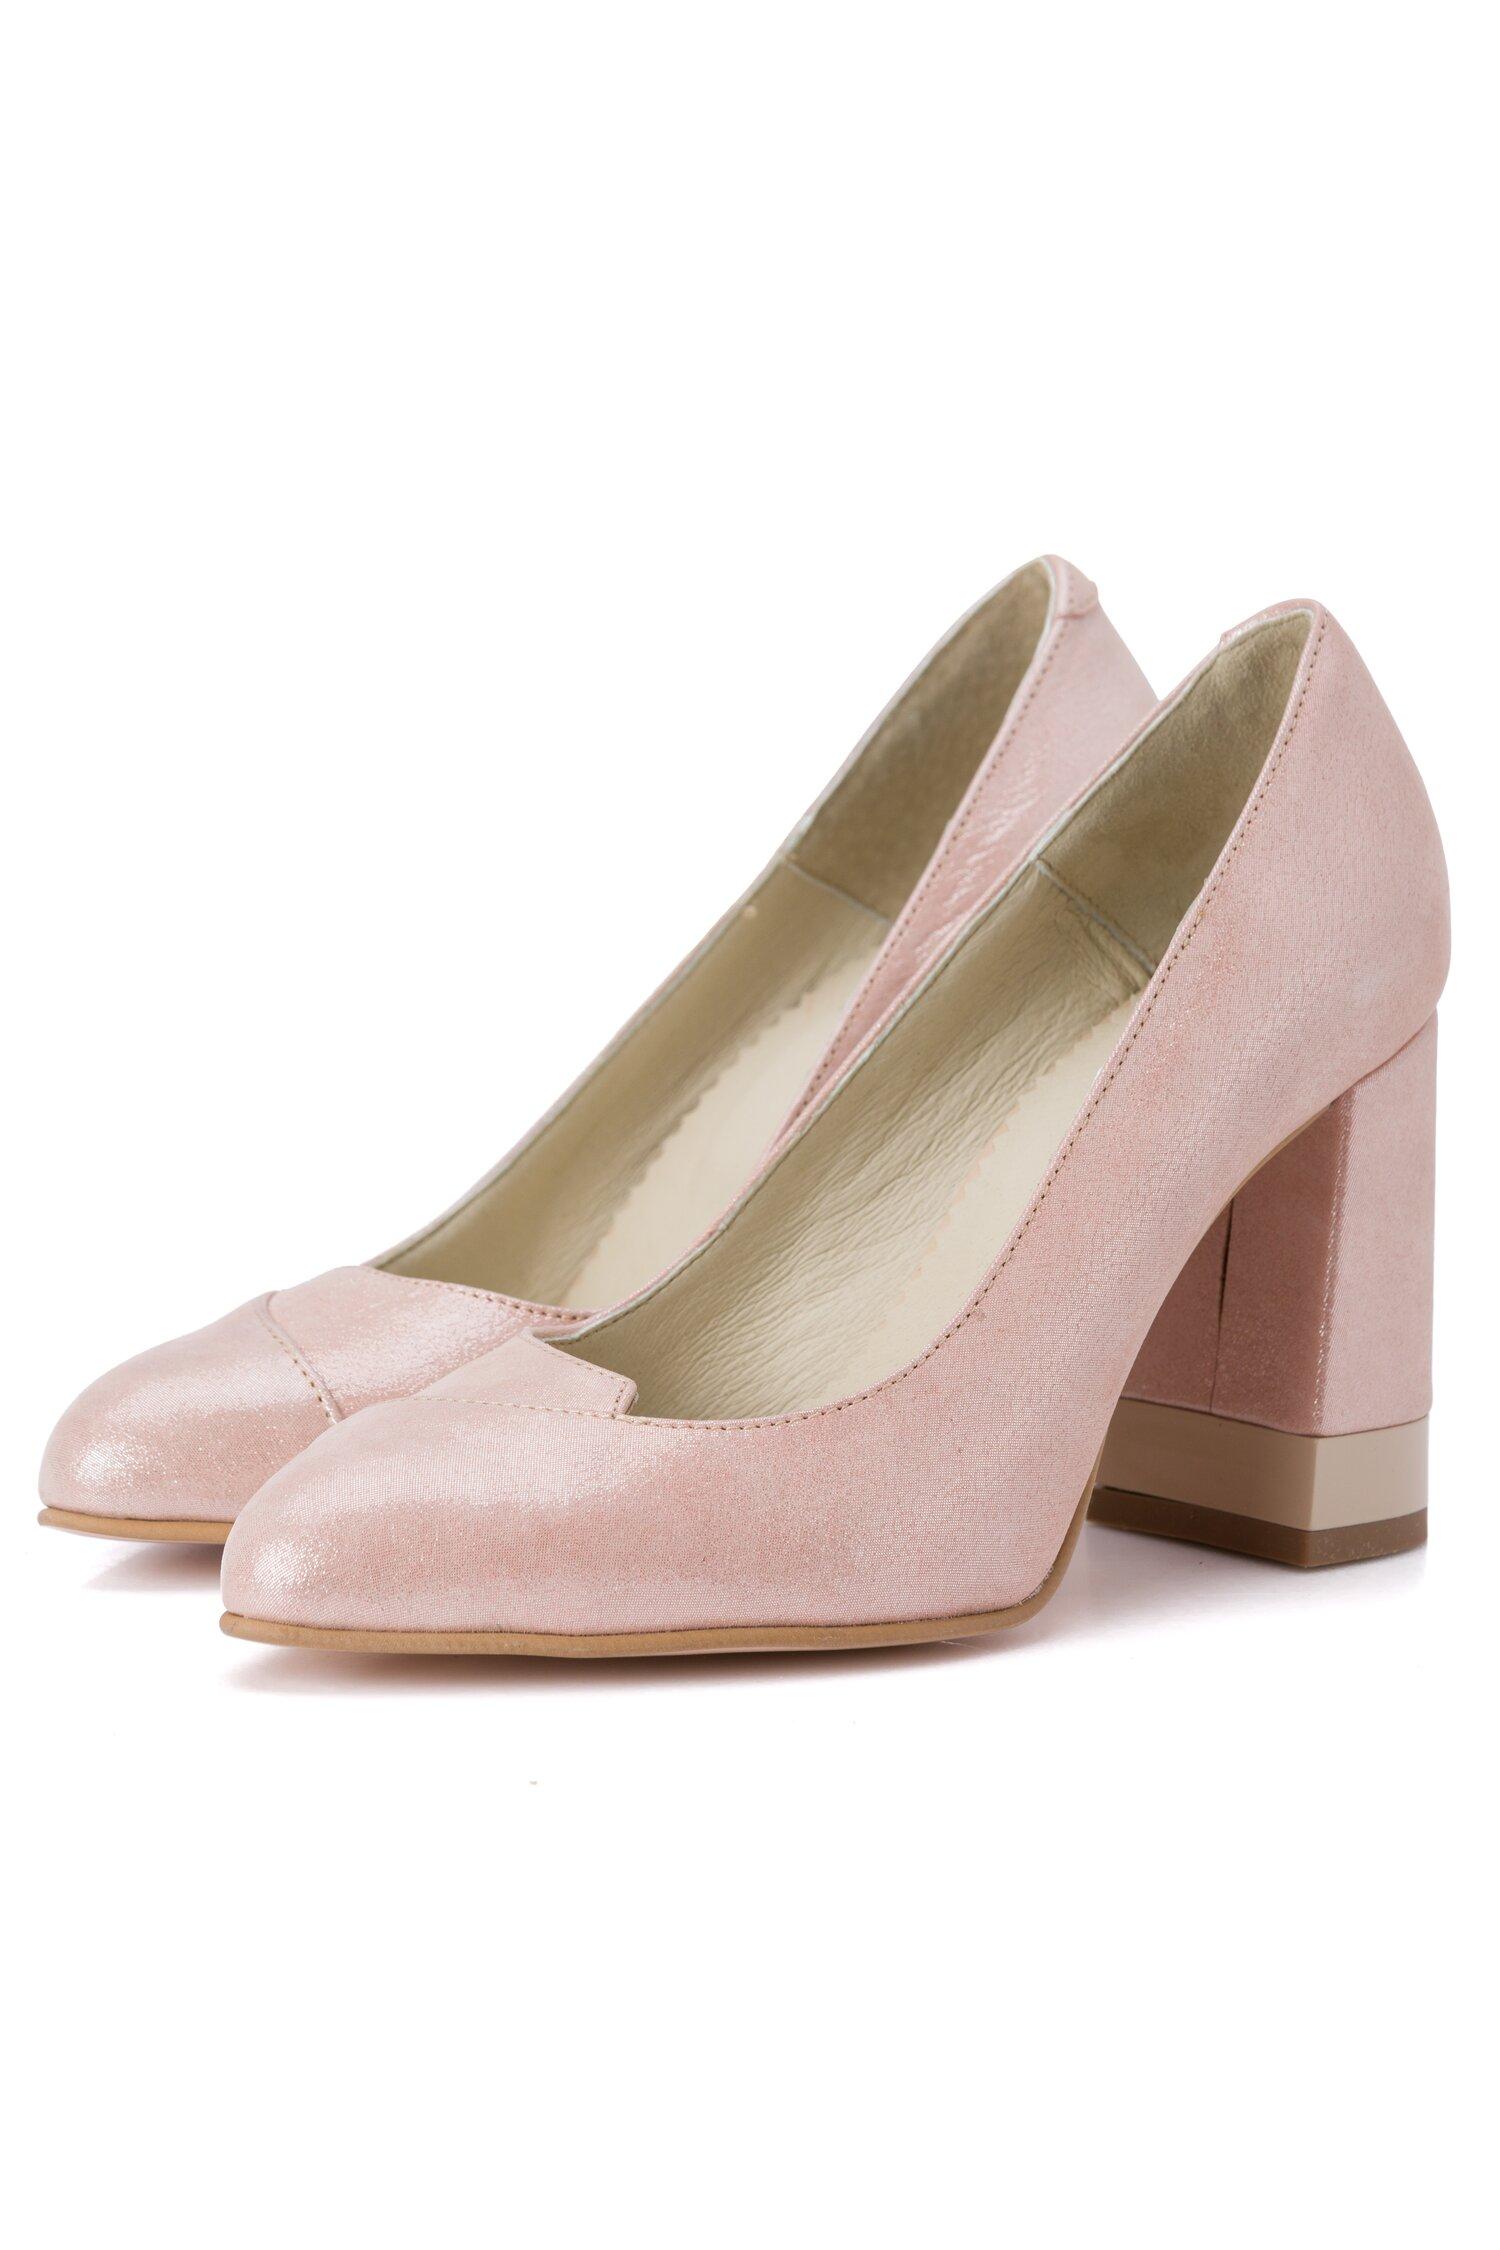 Pantofi bej sidefat cu toc gros si detalii stralucitoare imagine